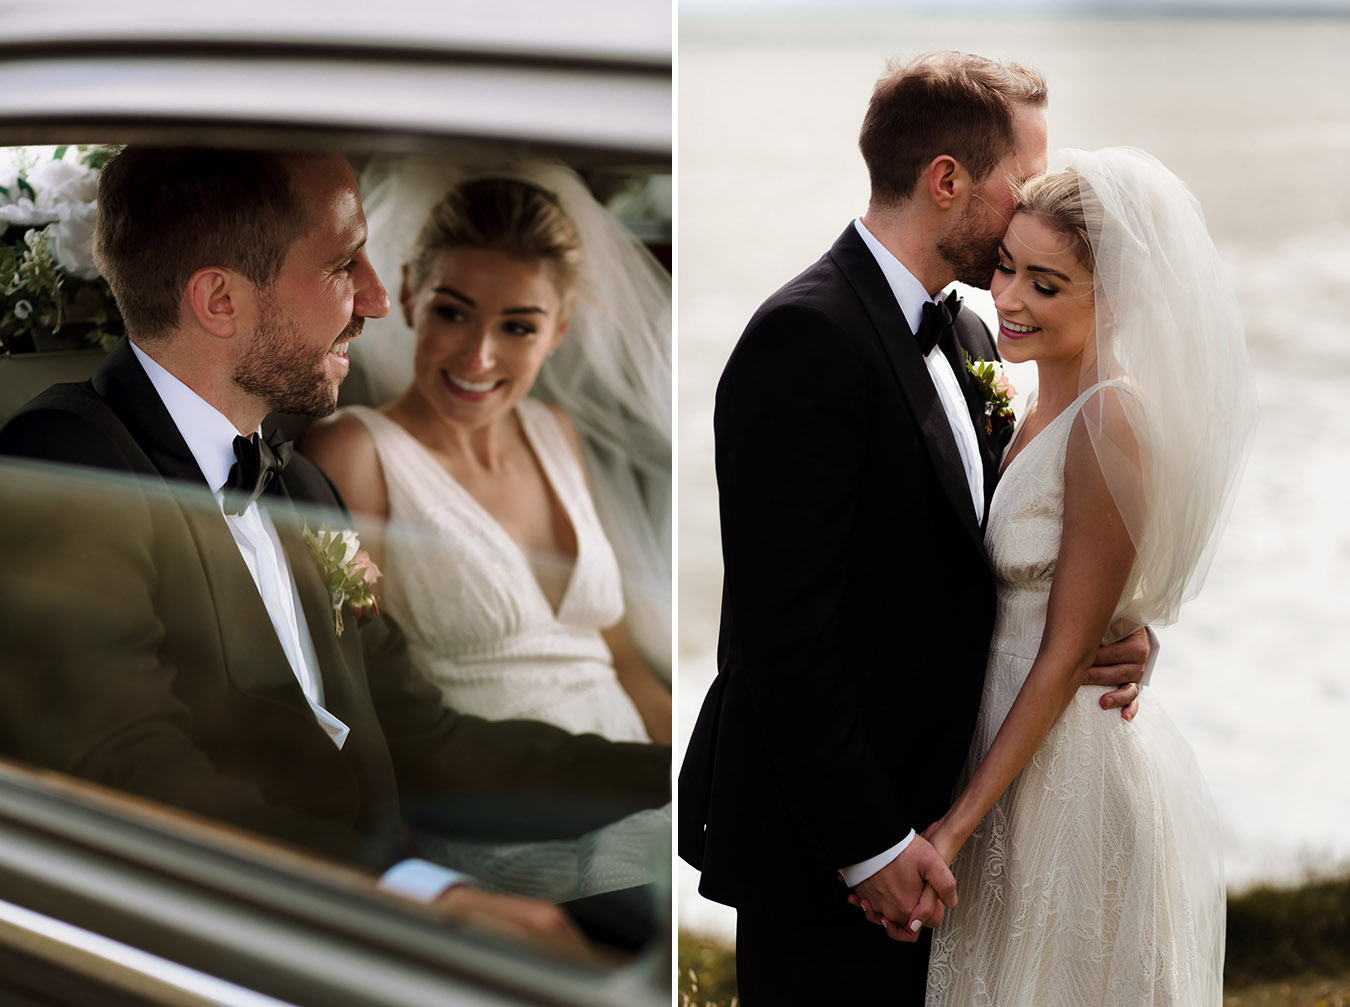 Myrtle ivory wedding dress